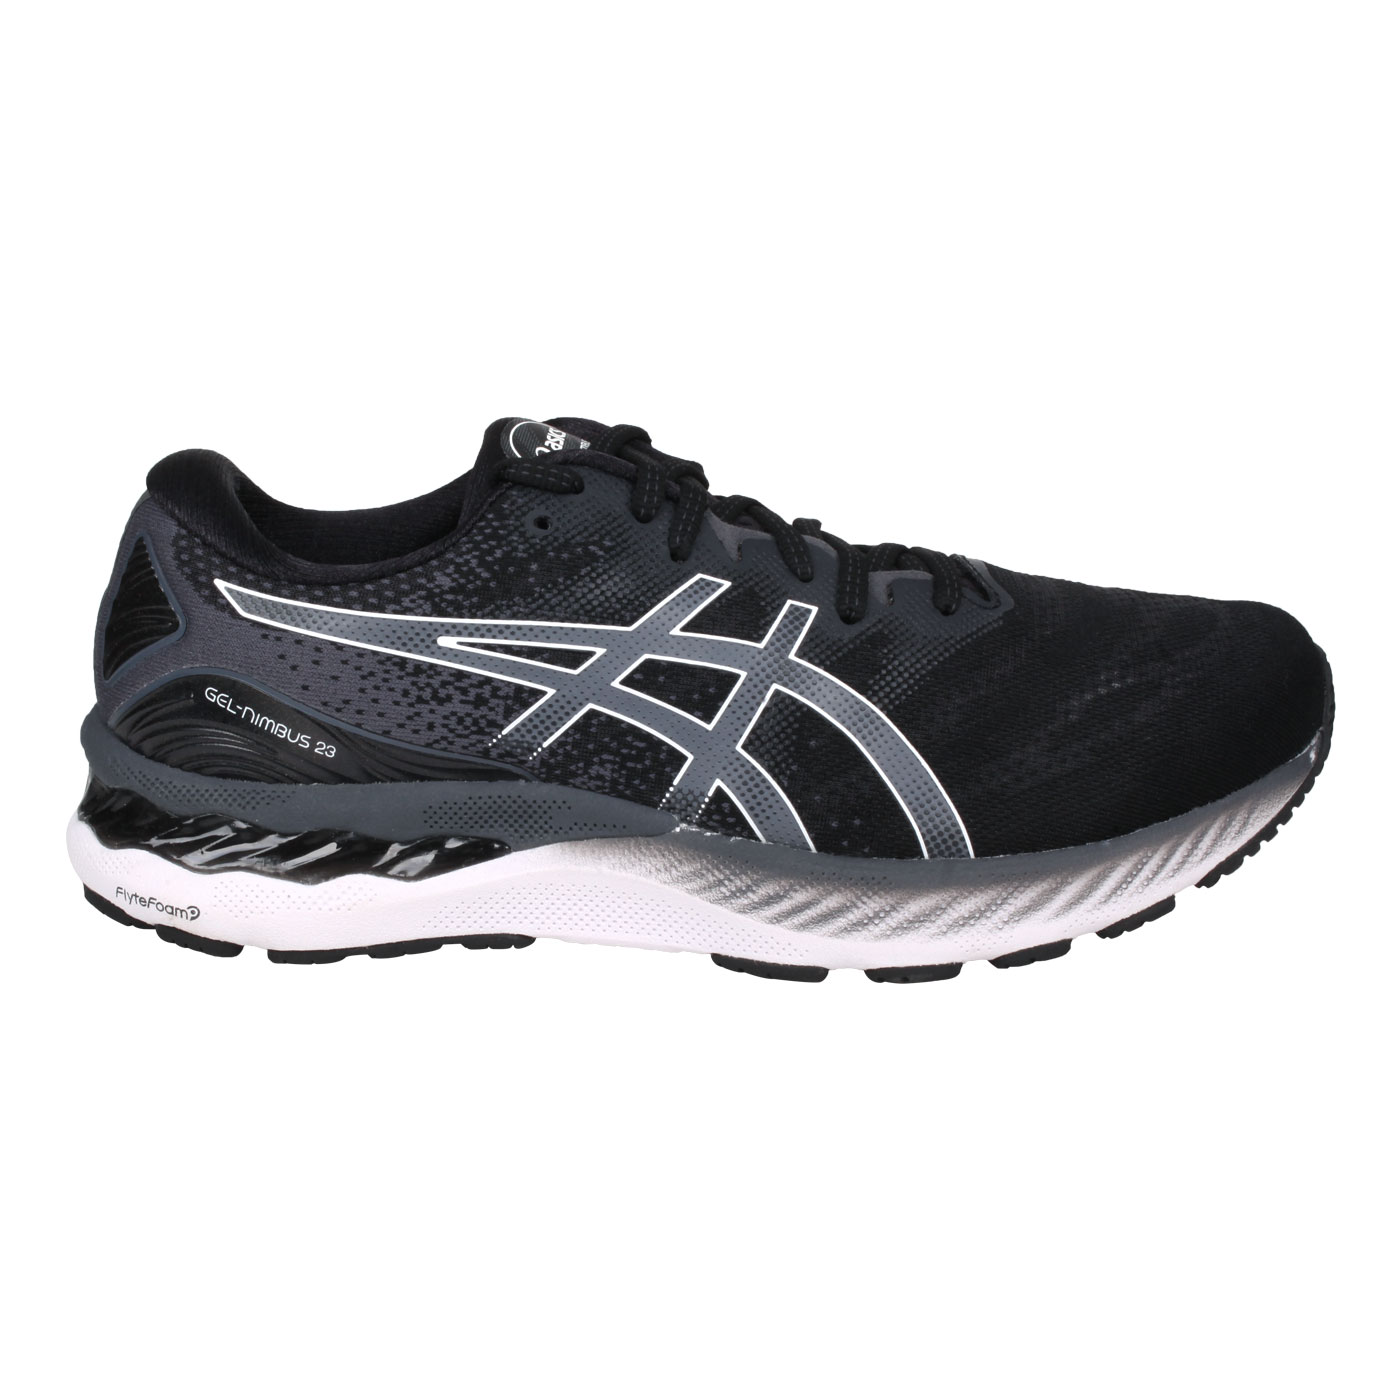 ASICS 男款慢跑鞋-4E  @GEL-NIMBUS 23@1011B005-001 - 黑灰白